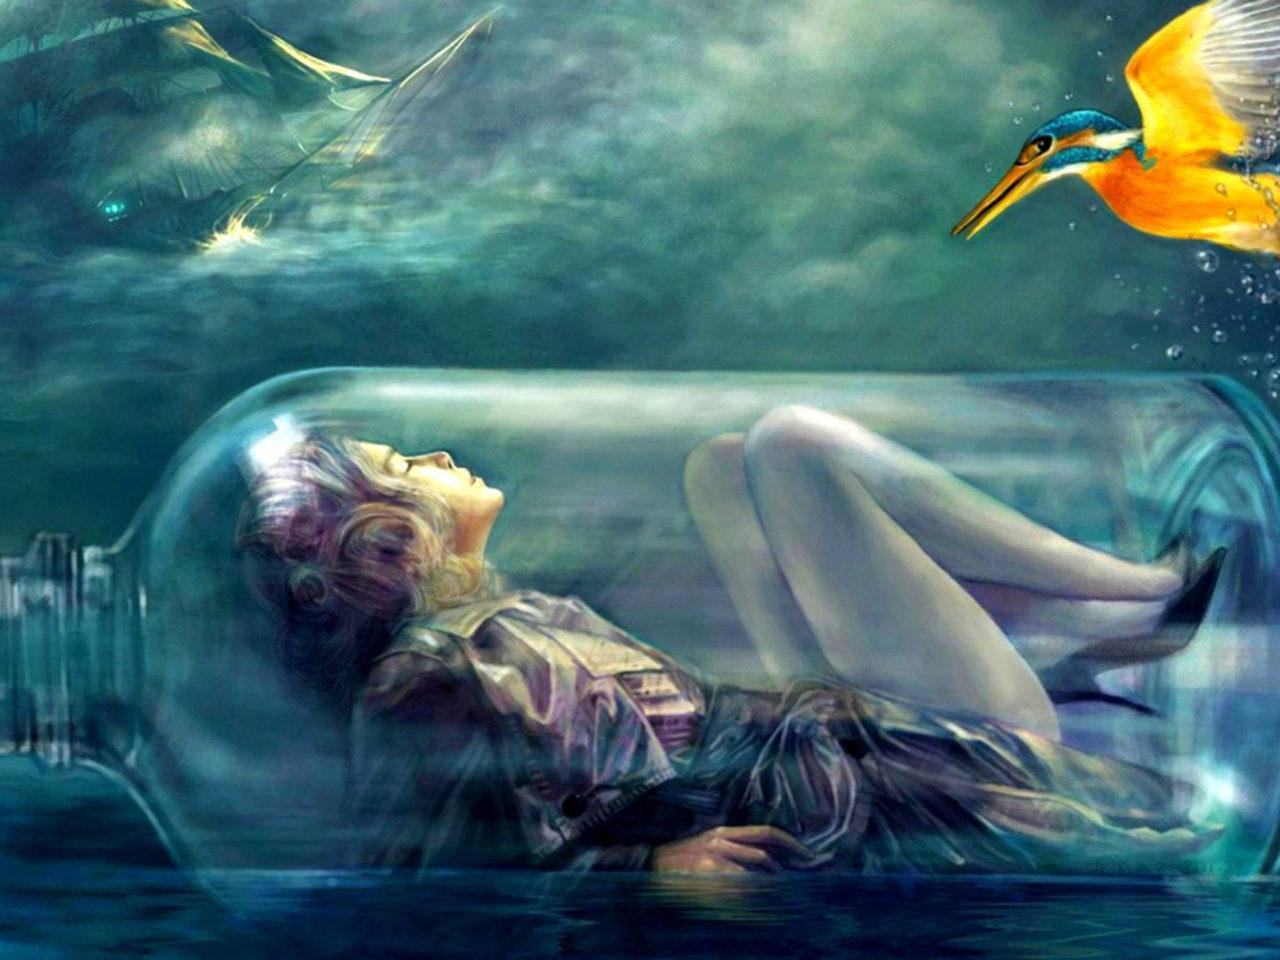 Girl Wallpaper For Iphone 5 Girl In A Glass Bottle Sea Ocean Bird Fantasy Hd Wallpaper